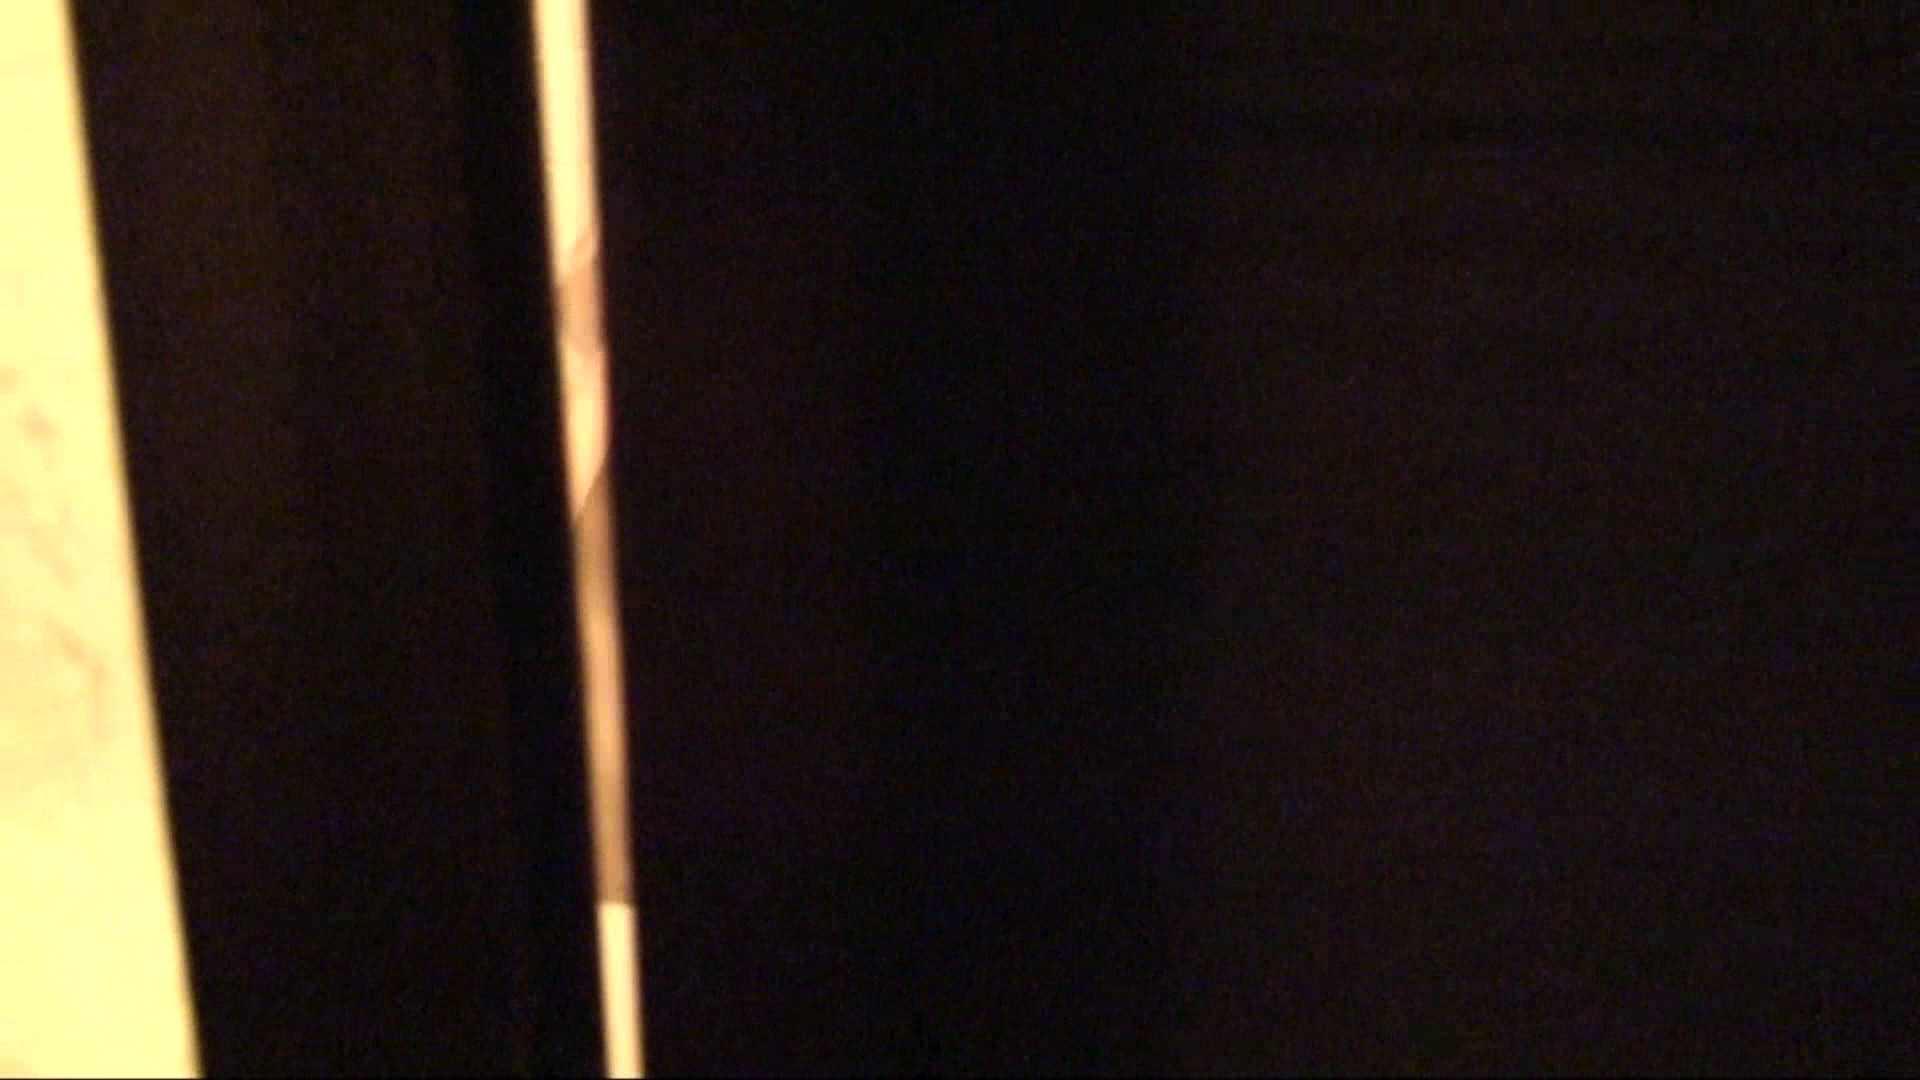 vol.02超可愛すぎる彼女の裸体をハイビジョンで!至近距離での眺め最高! 覗き ワレメ無修正動画無料 78pic 65